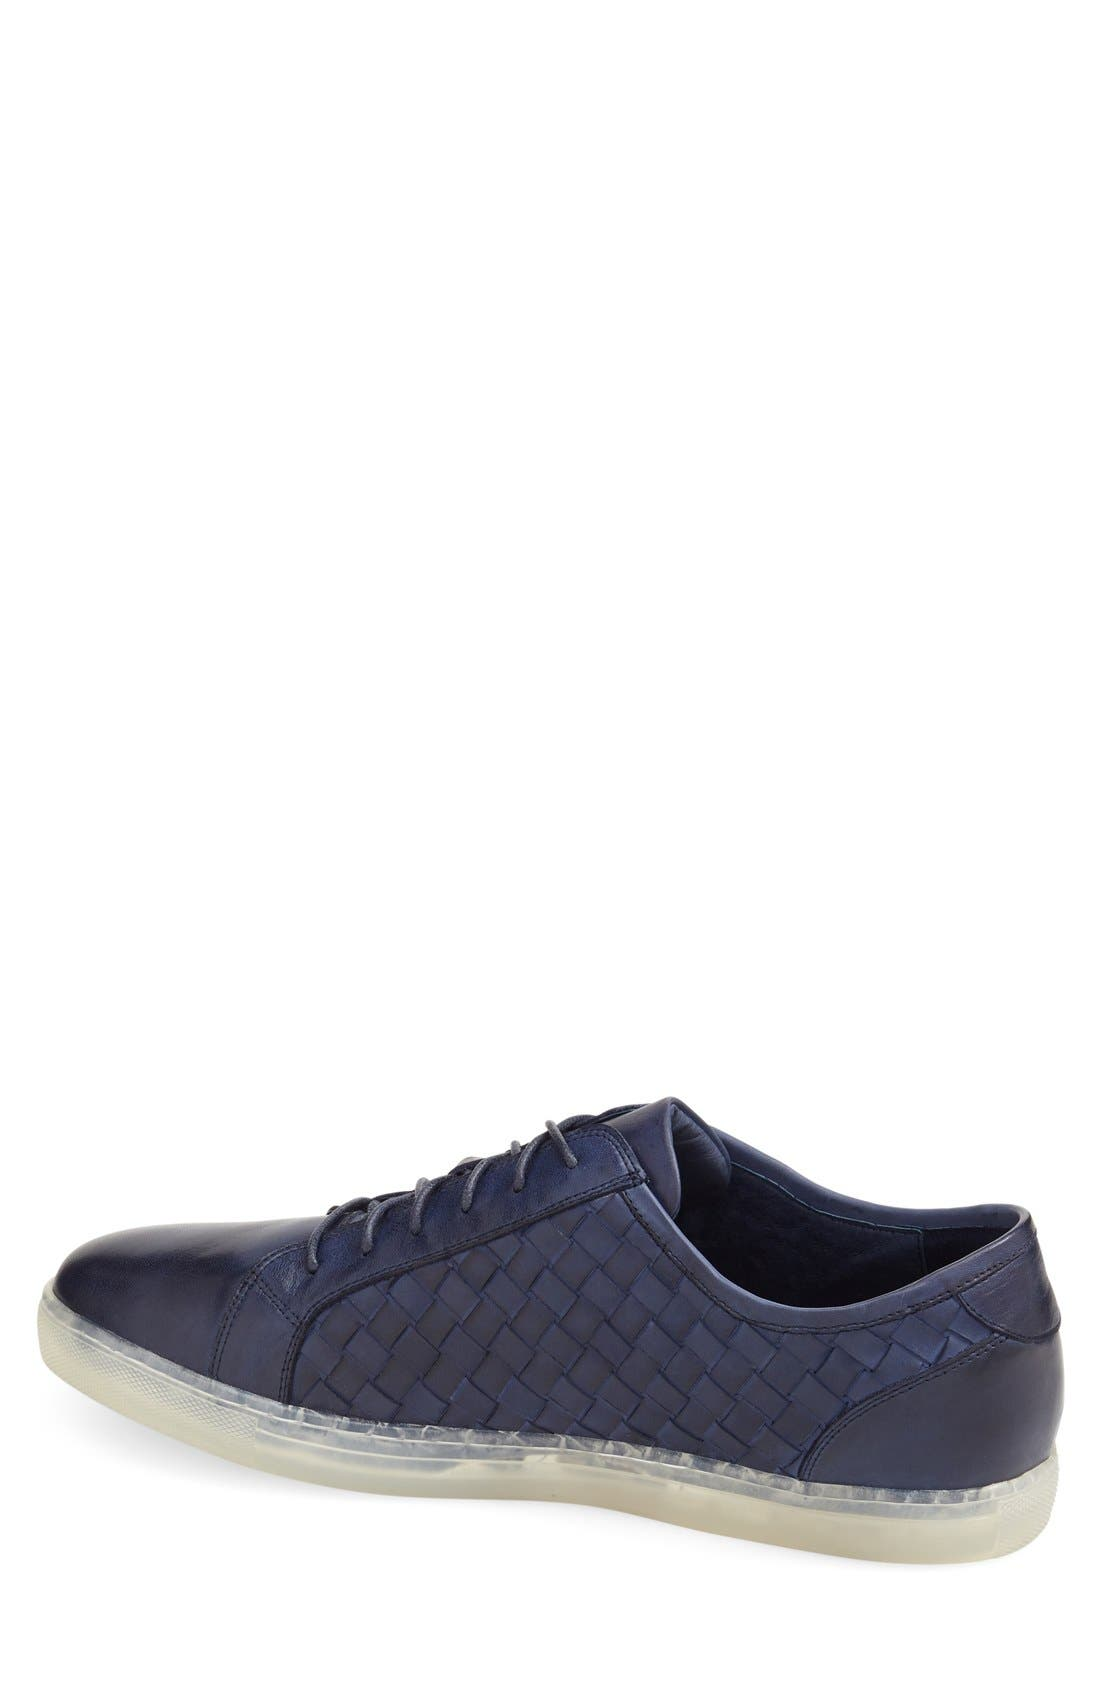 Fader Sneaker,                             Alternate thumbnail 6, color,